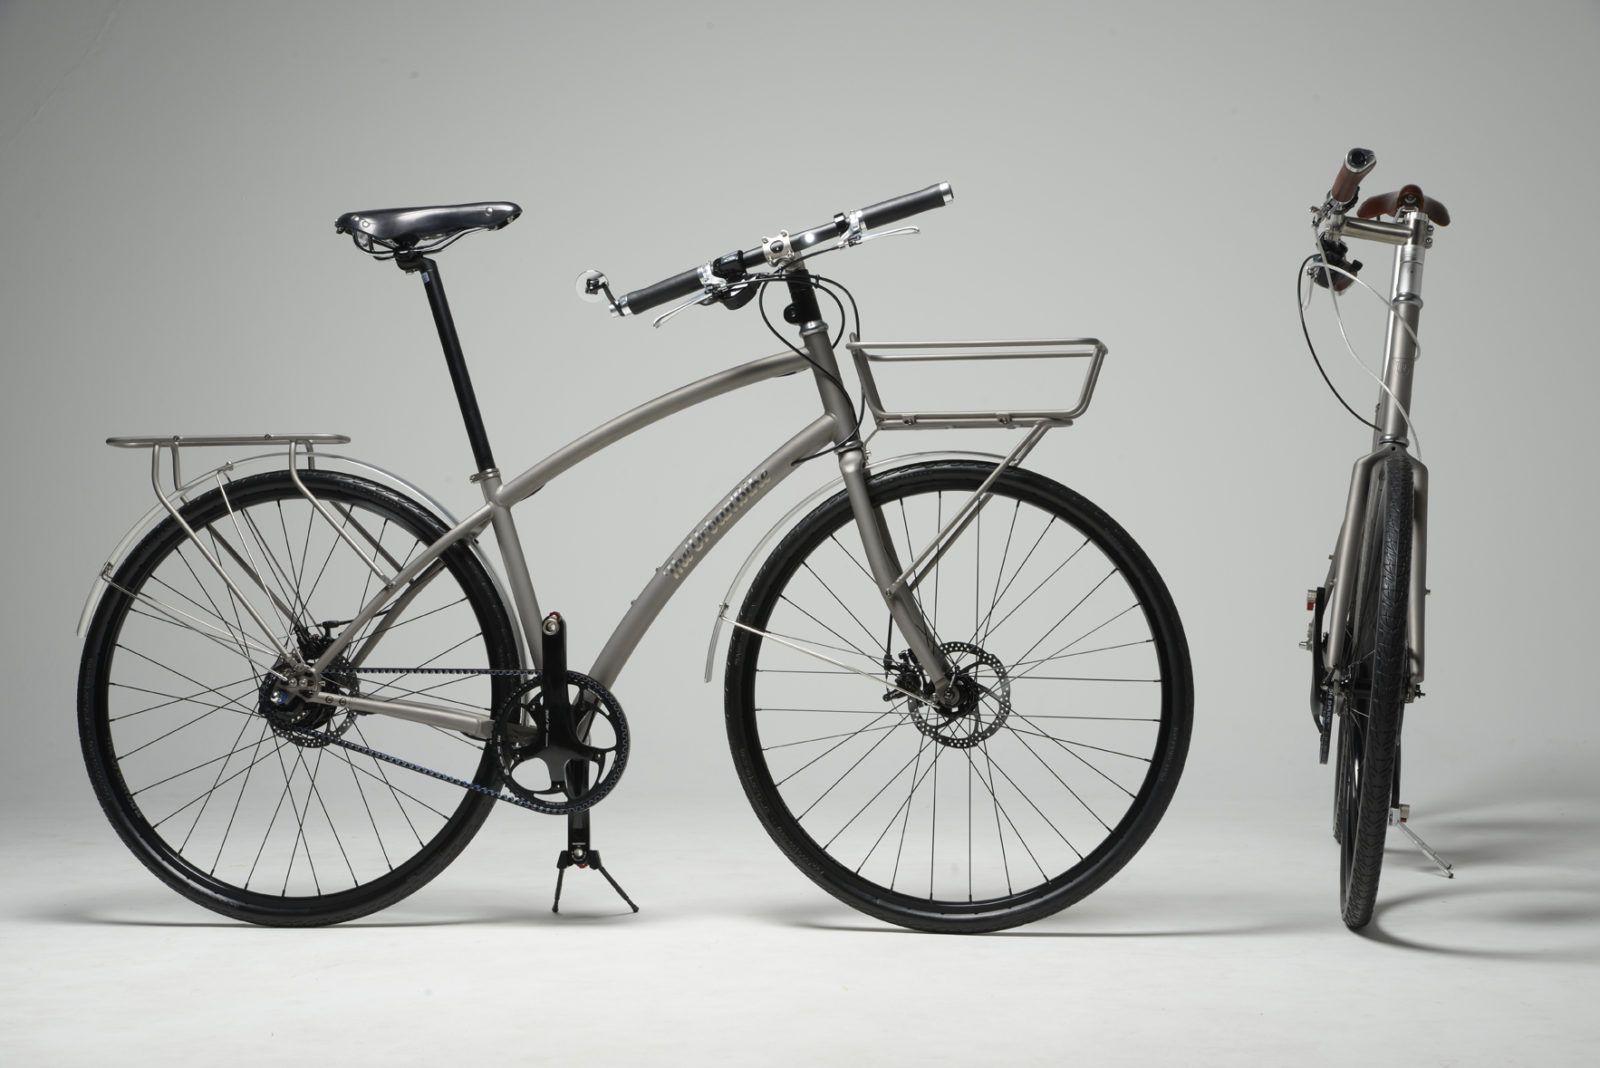 The Urban Bike City Rider Ct 9 1 Urban Bike Bike Bicycle